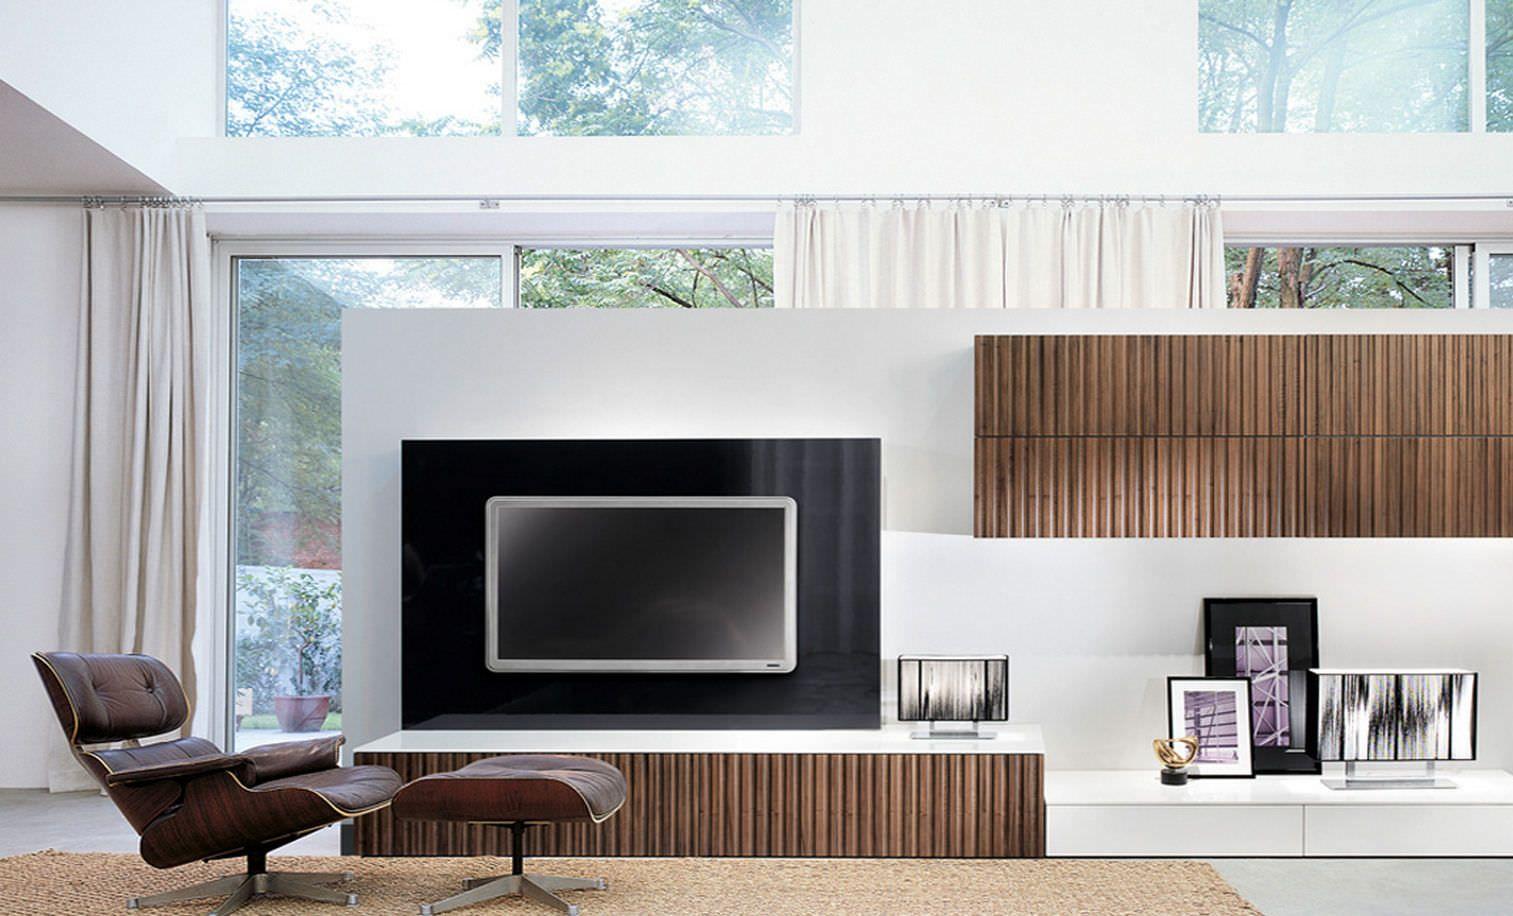 contemporary tv wall unit  lacquered time besana  home  - contemporary tv wall unit  lacquered time besana  home furnishing pinterest  google tvs och sök